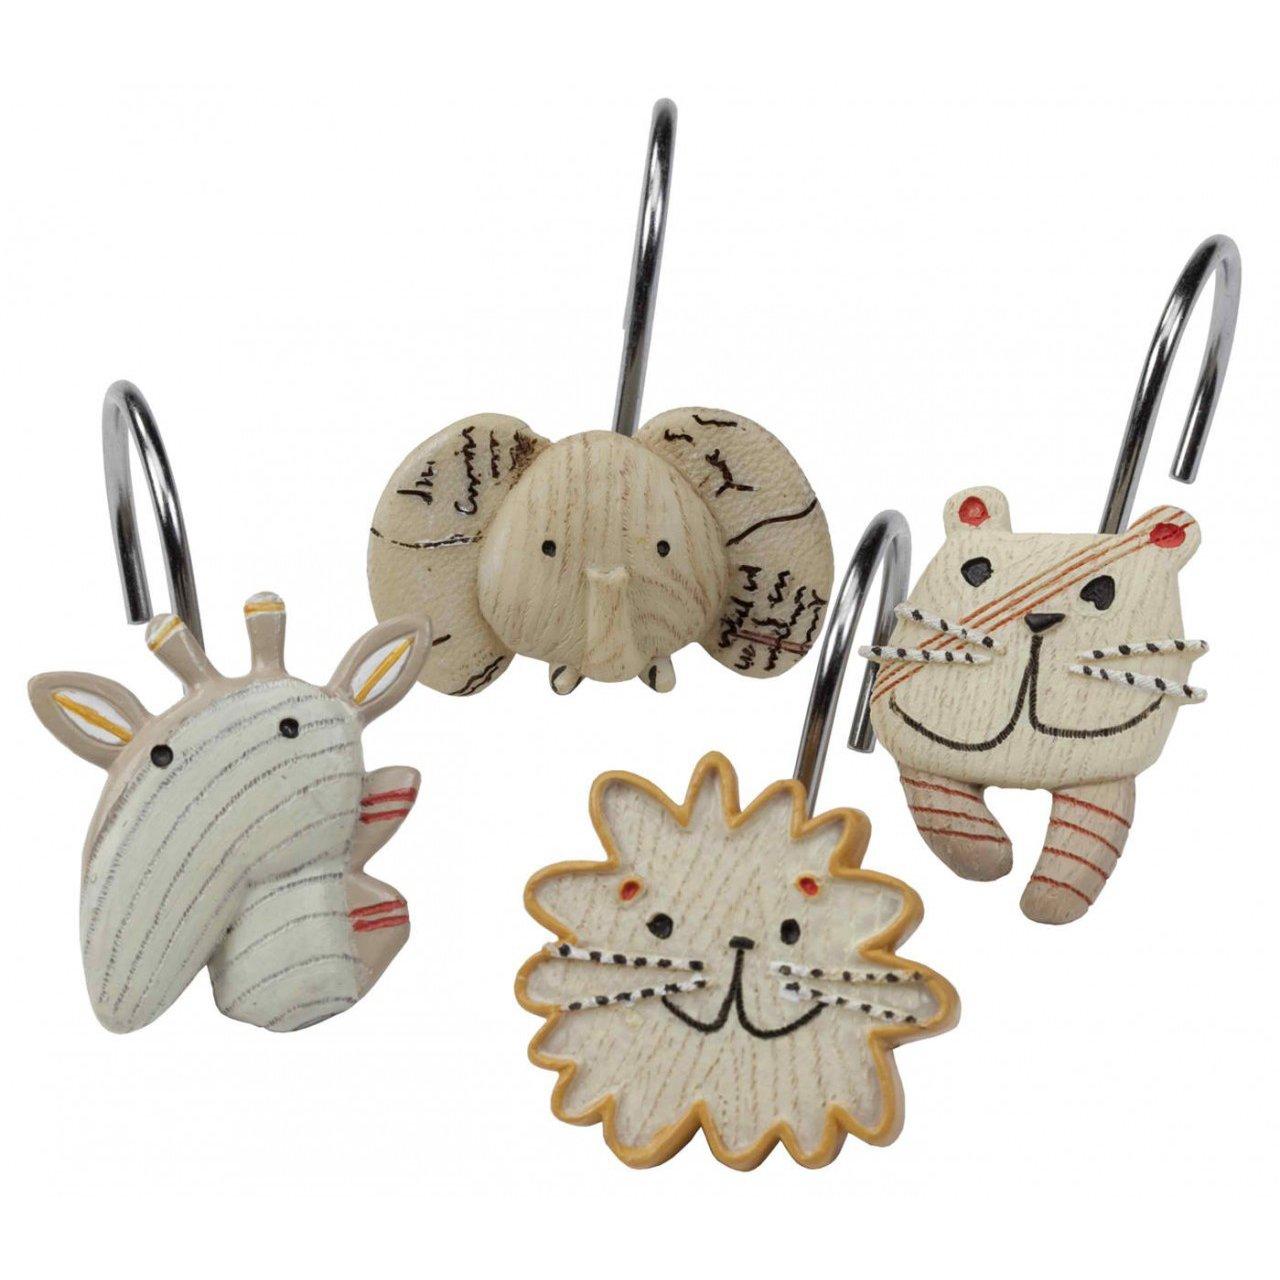 DS BATH Animal Crackers Shower Curtain Hooks, Hooks for Bathroom Curtains,Decorative Bath Curtain Hooks,set of 12